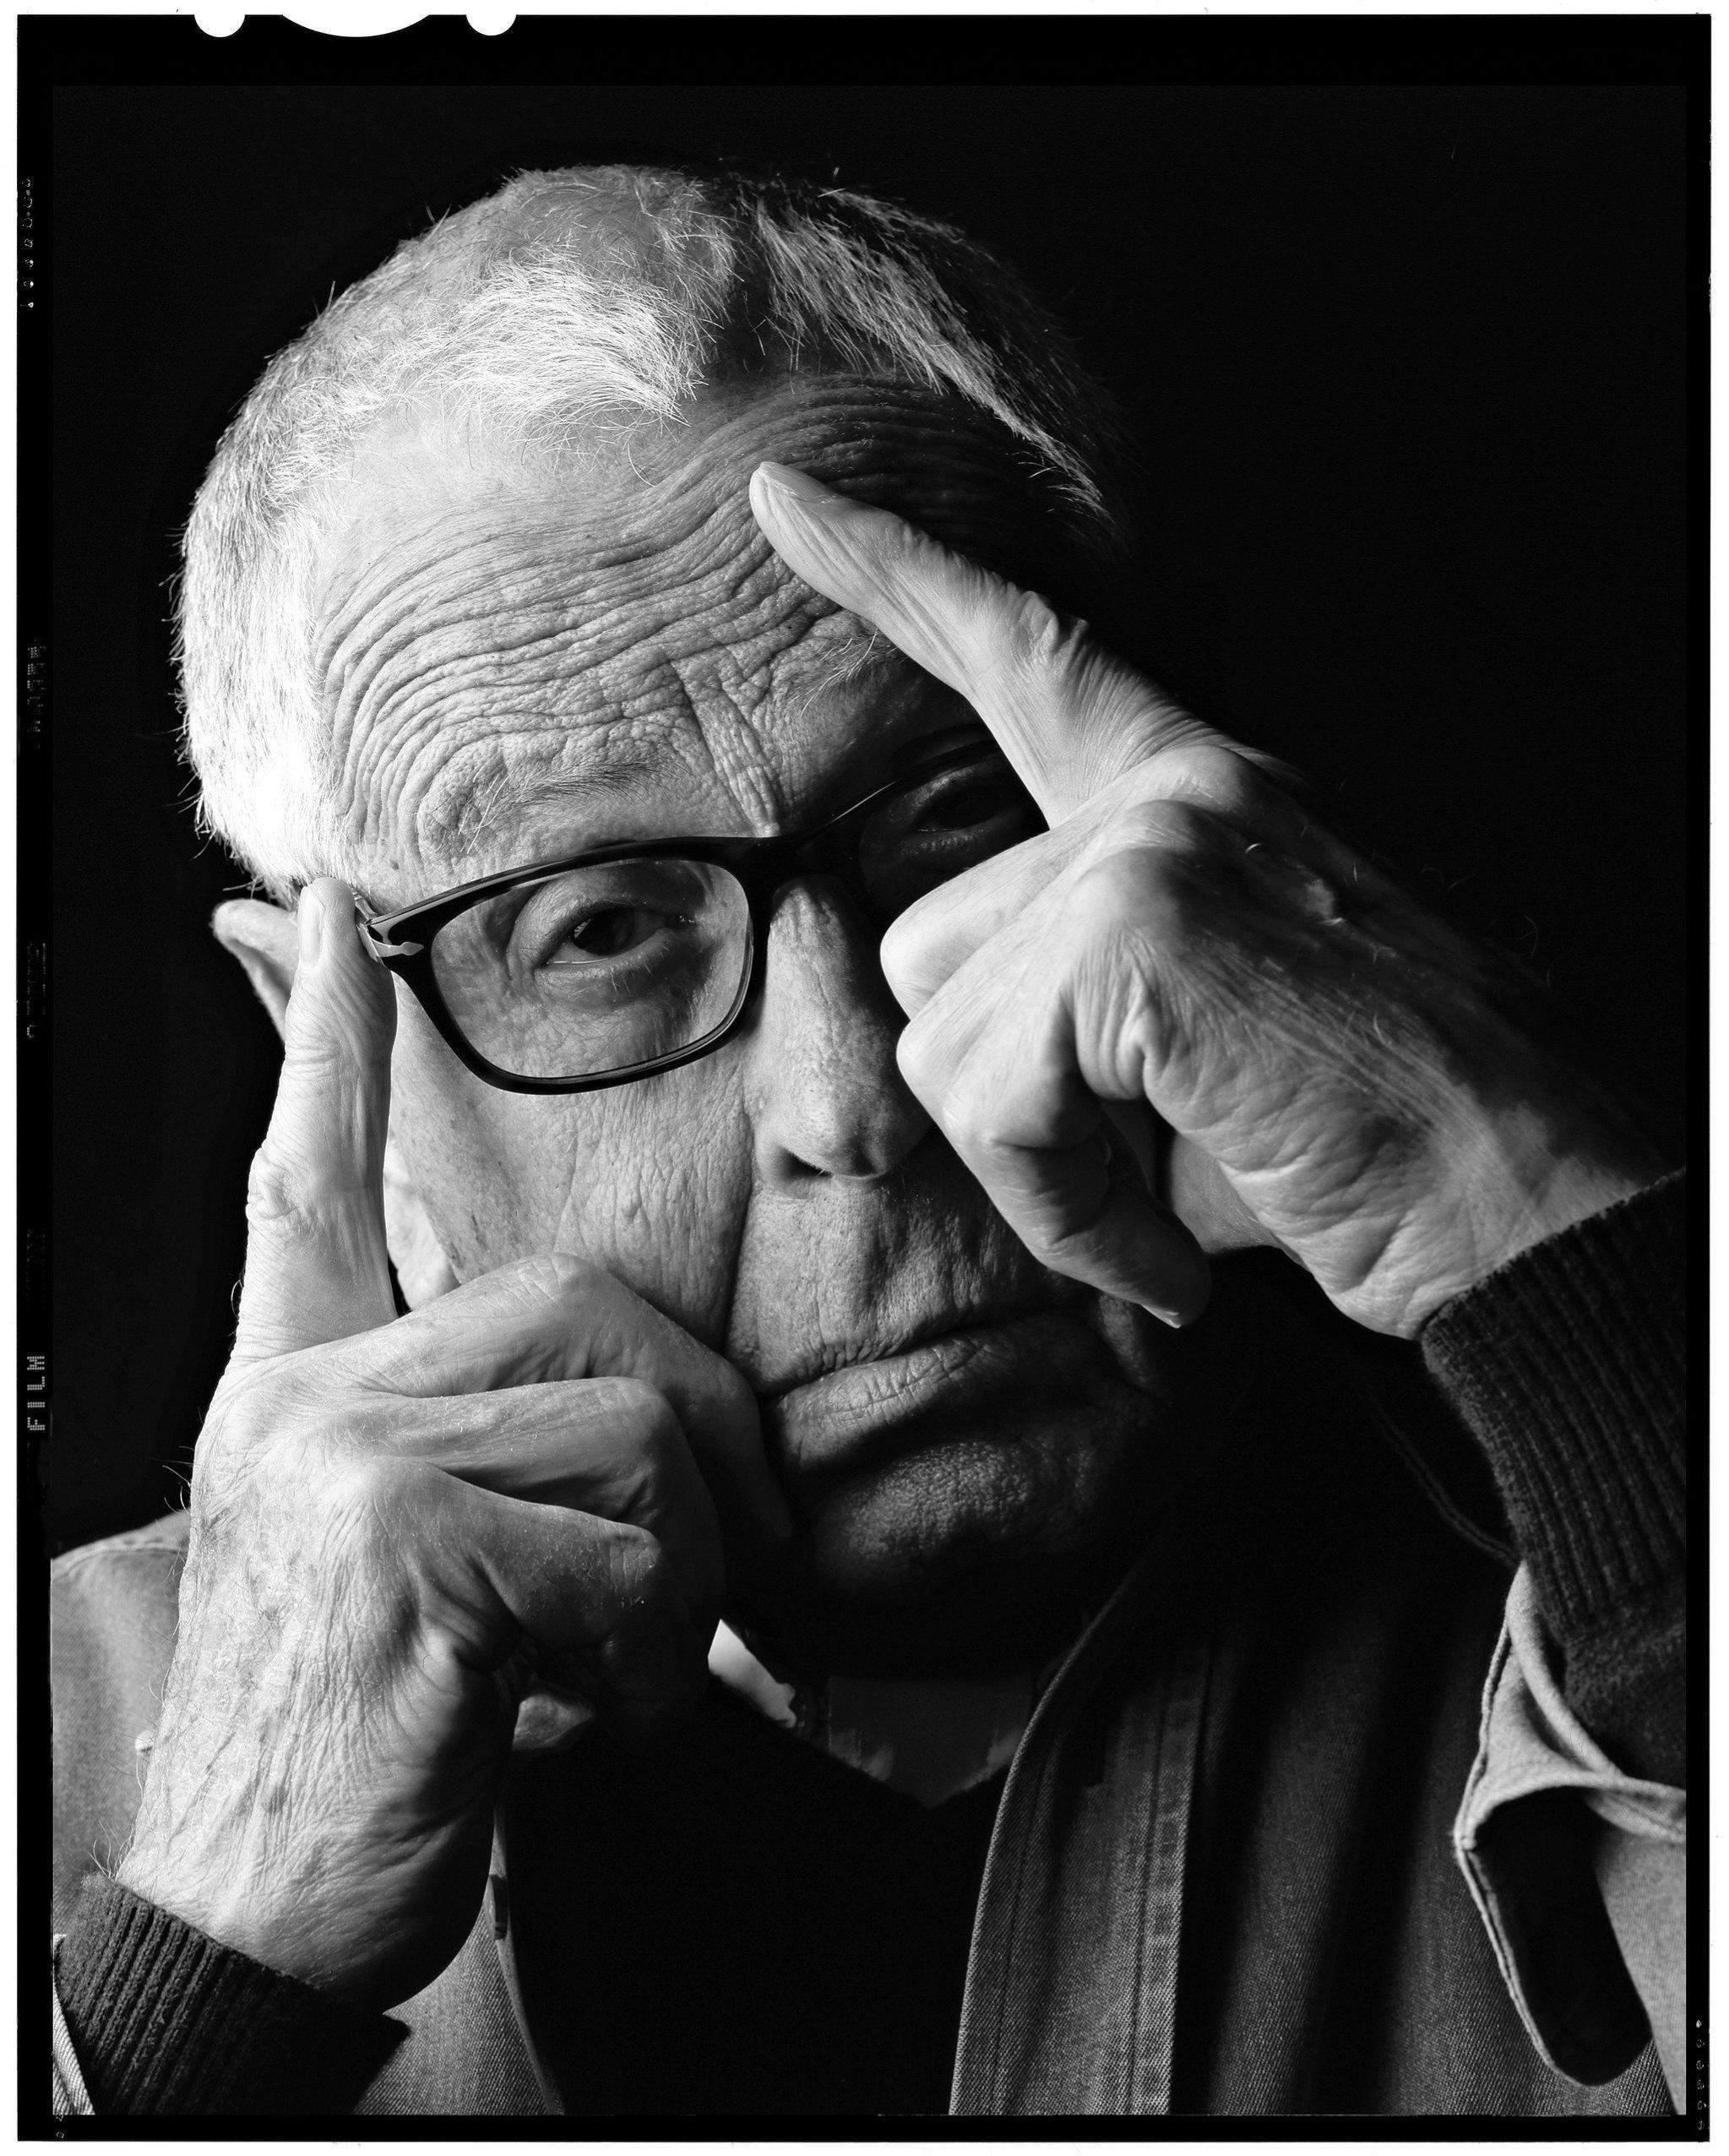 El escultor Martín Chirino (Las Palmas, 1925- Madrid, 2019).